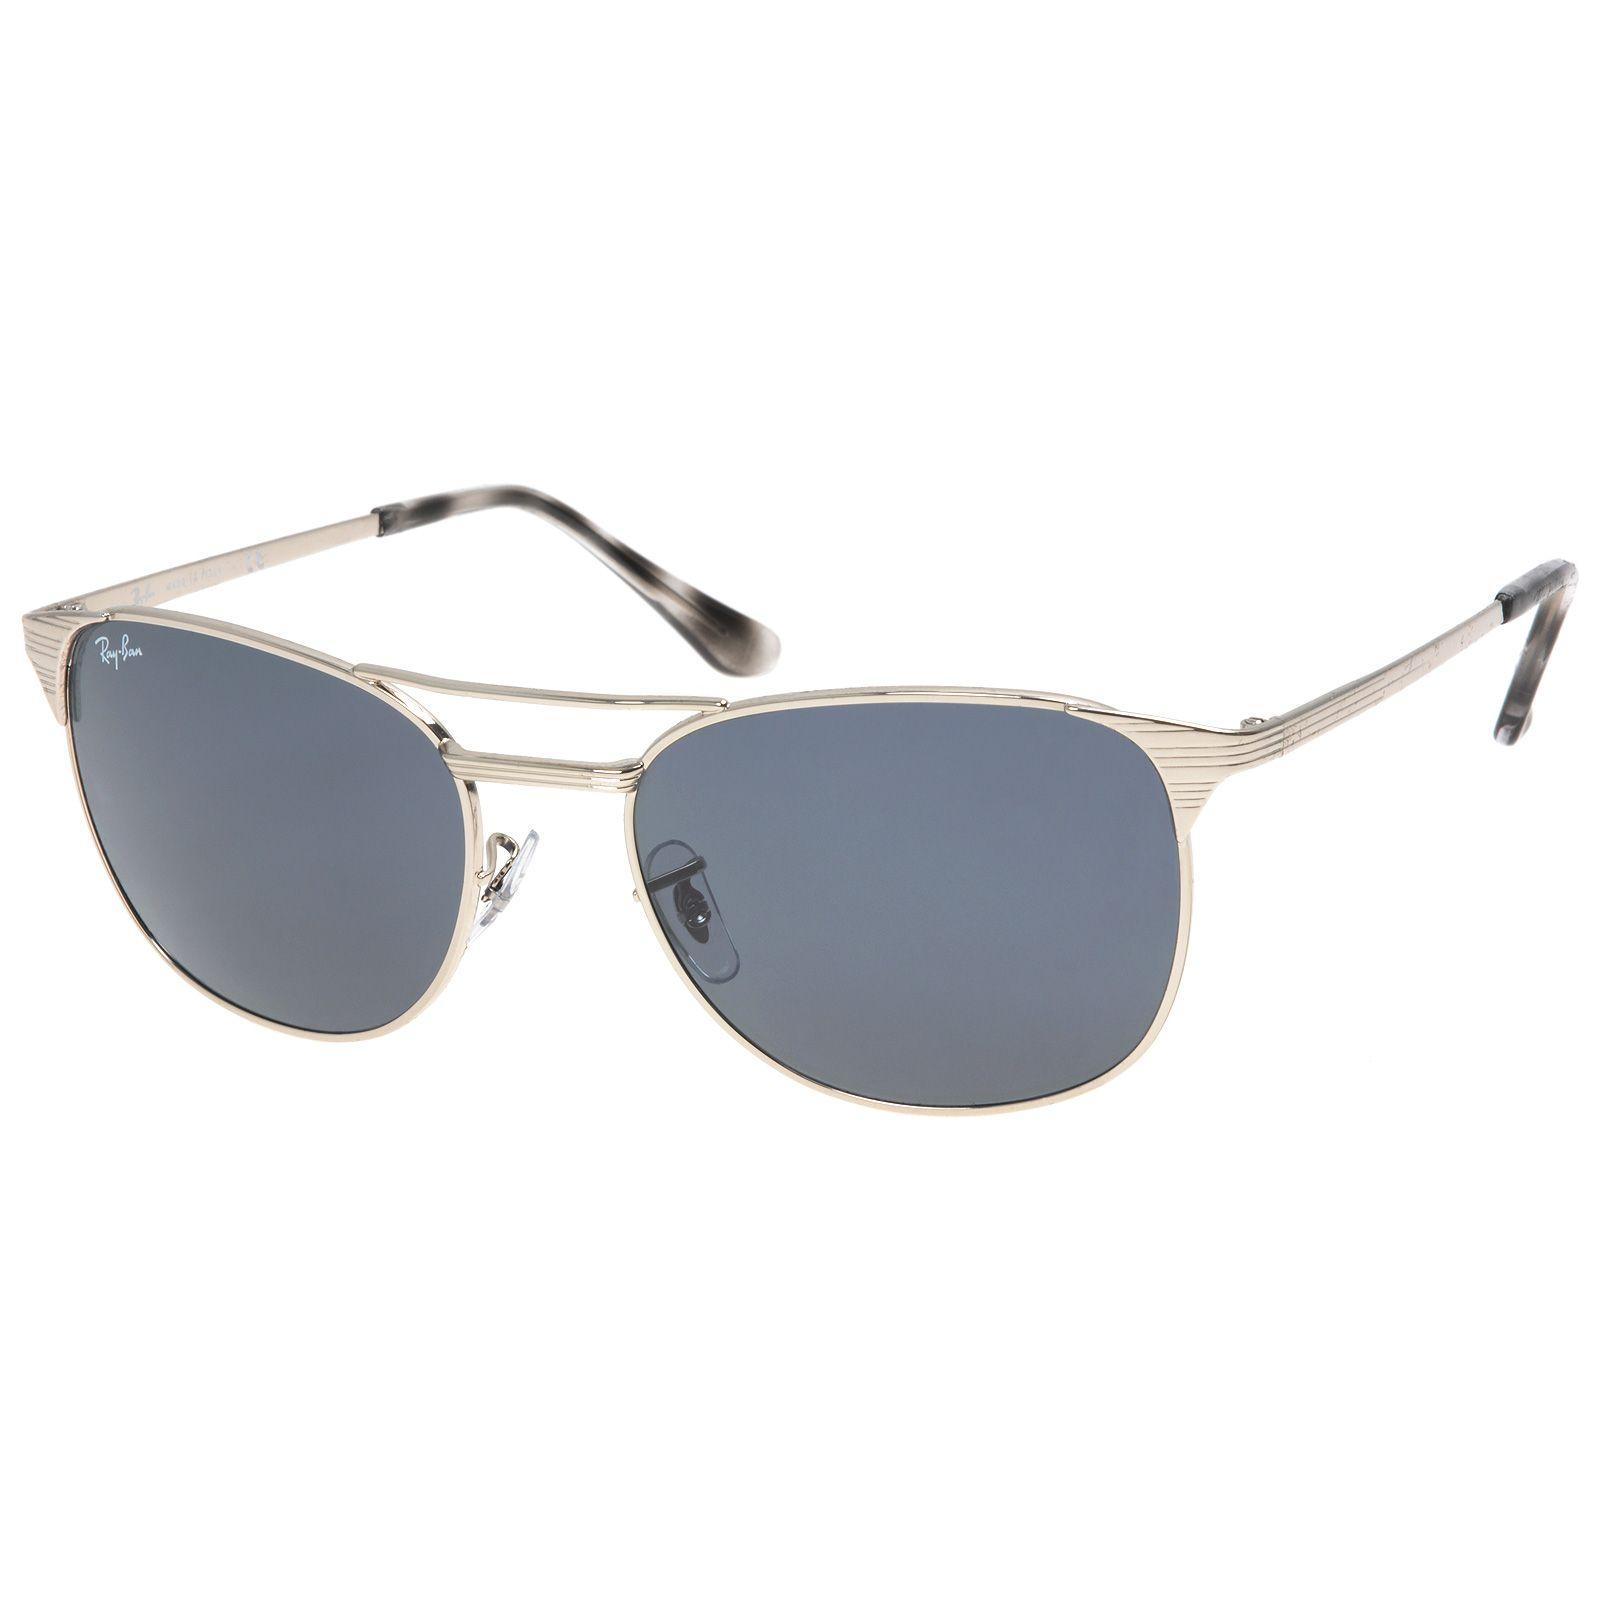 8c0287815f Ray-Ban Signet 3429-M 003 R5 Silber  rayban  sunglasses ...